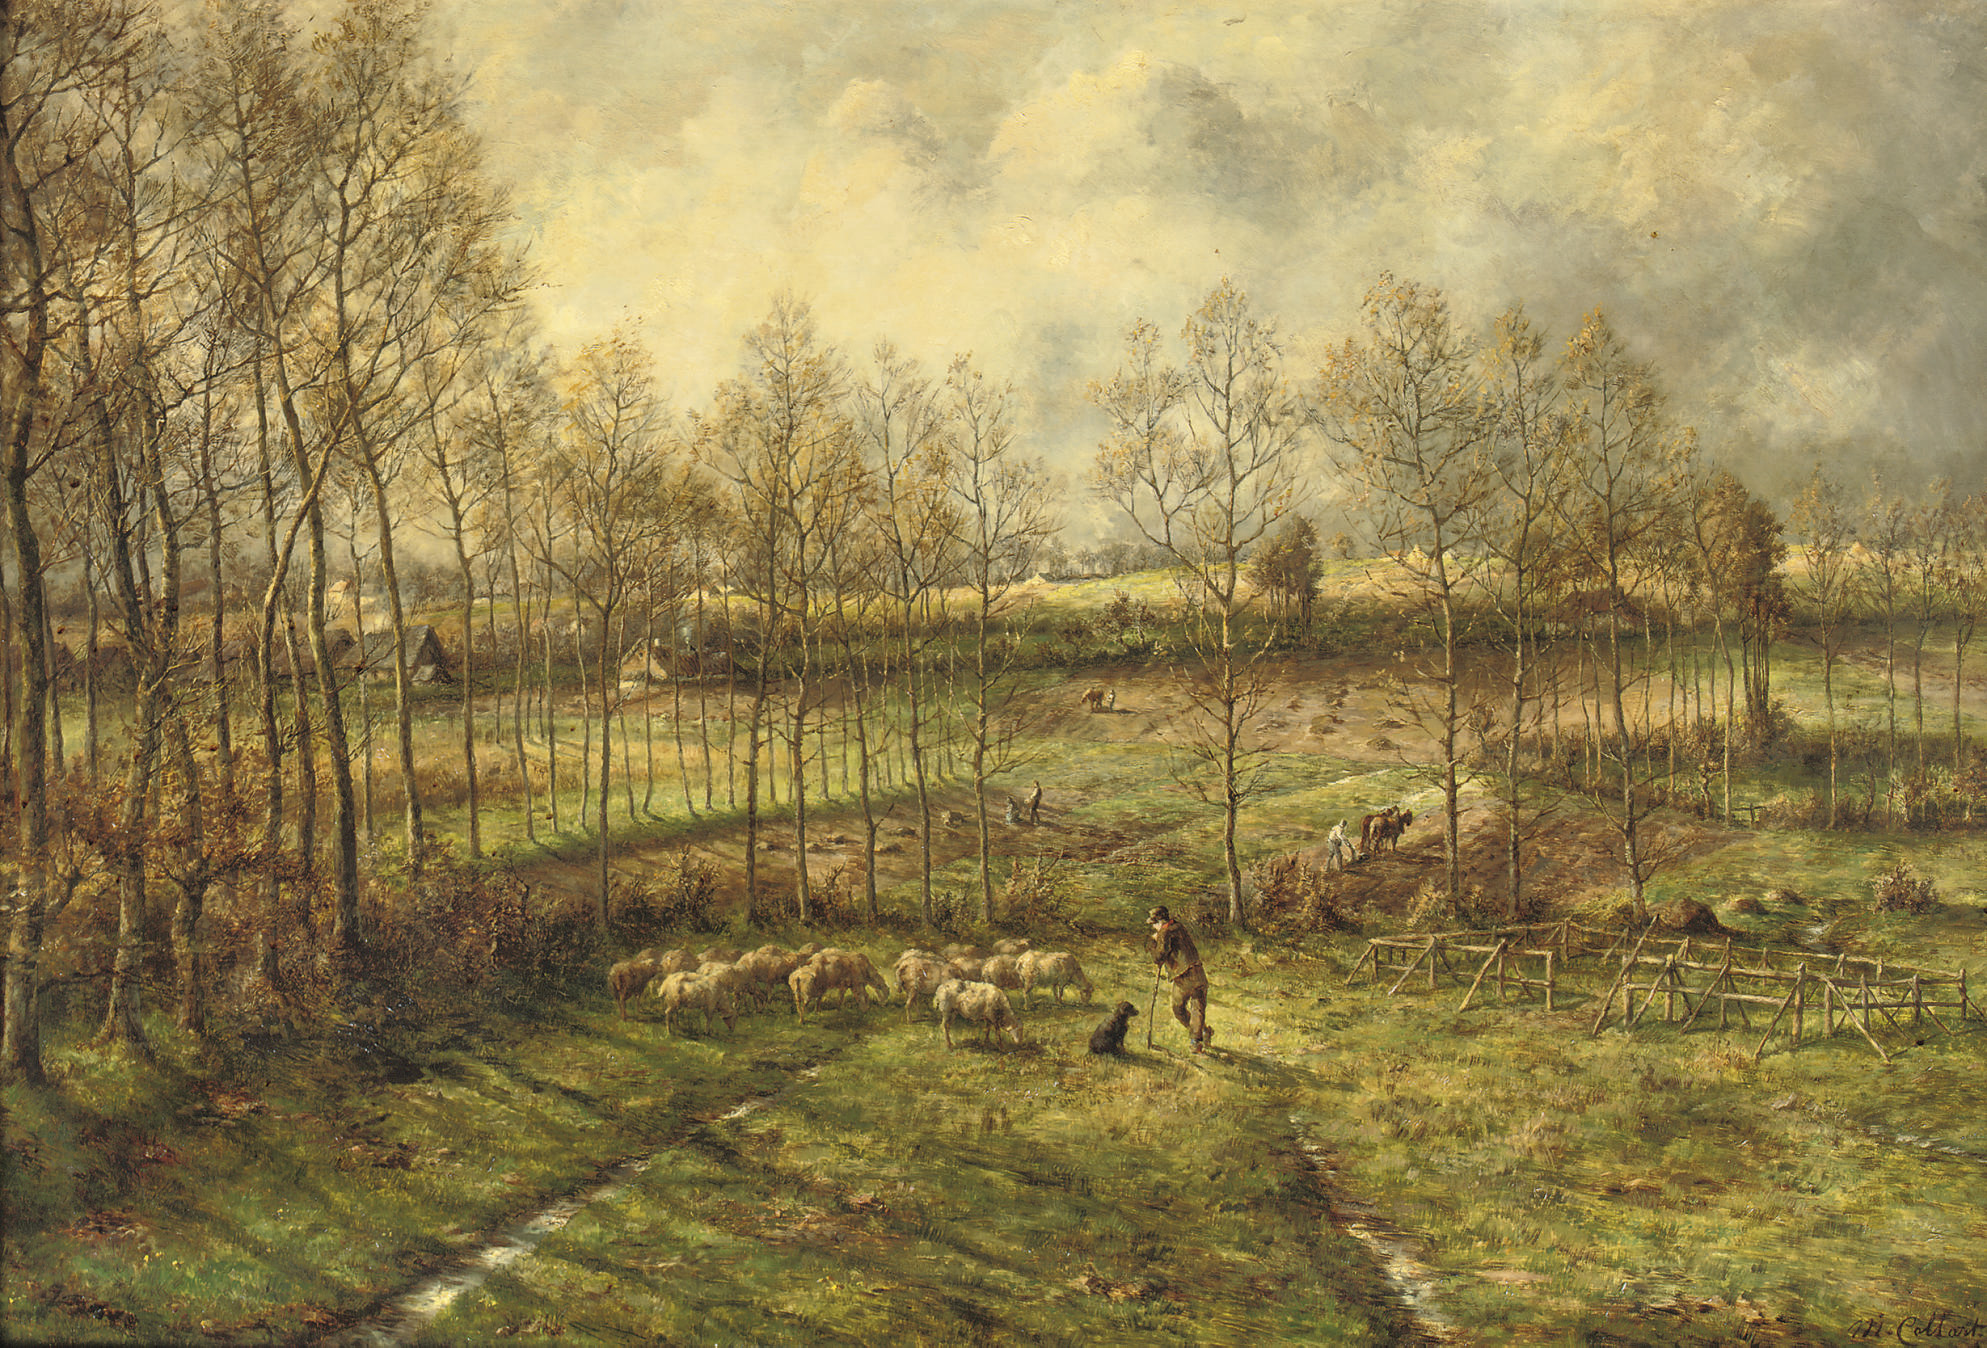 La campagne en mars: sheep grazing in a pasture